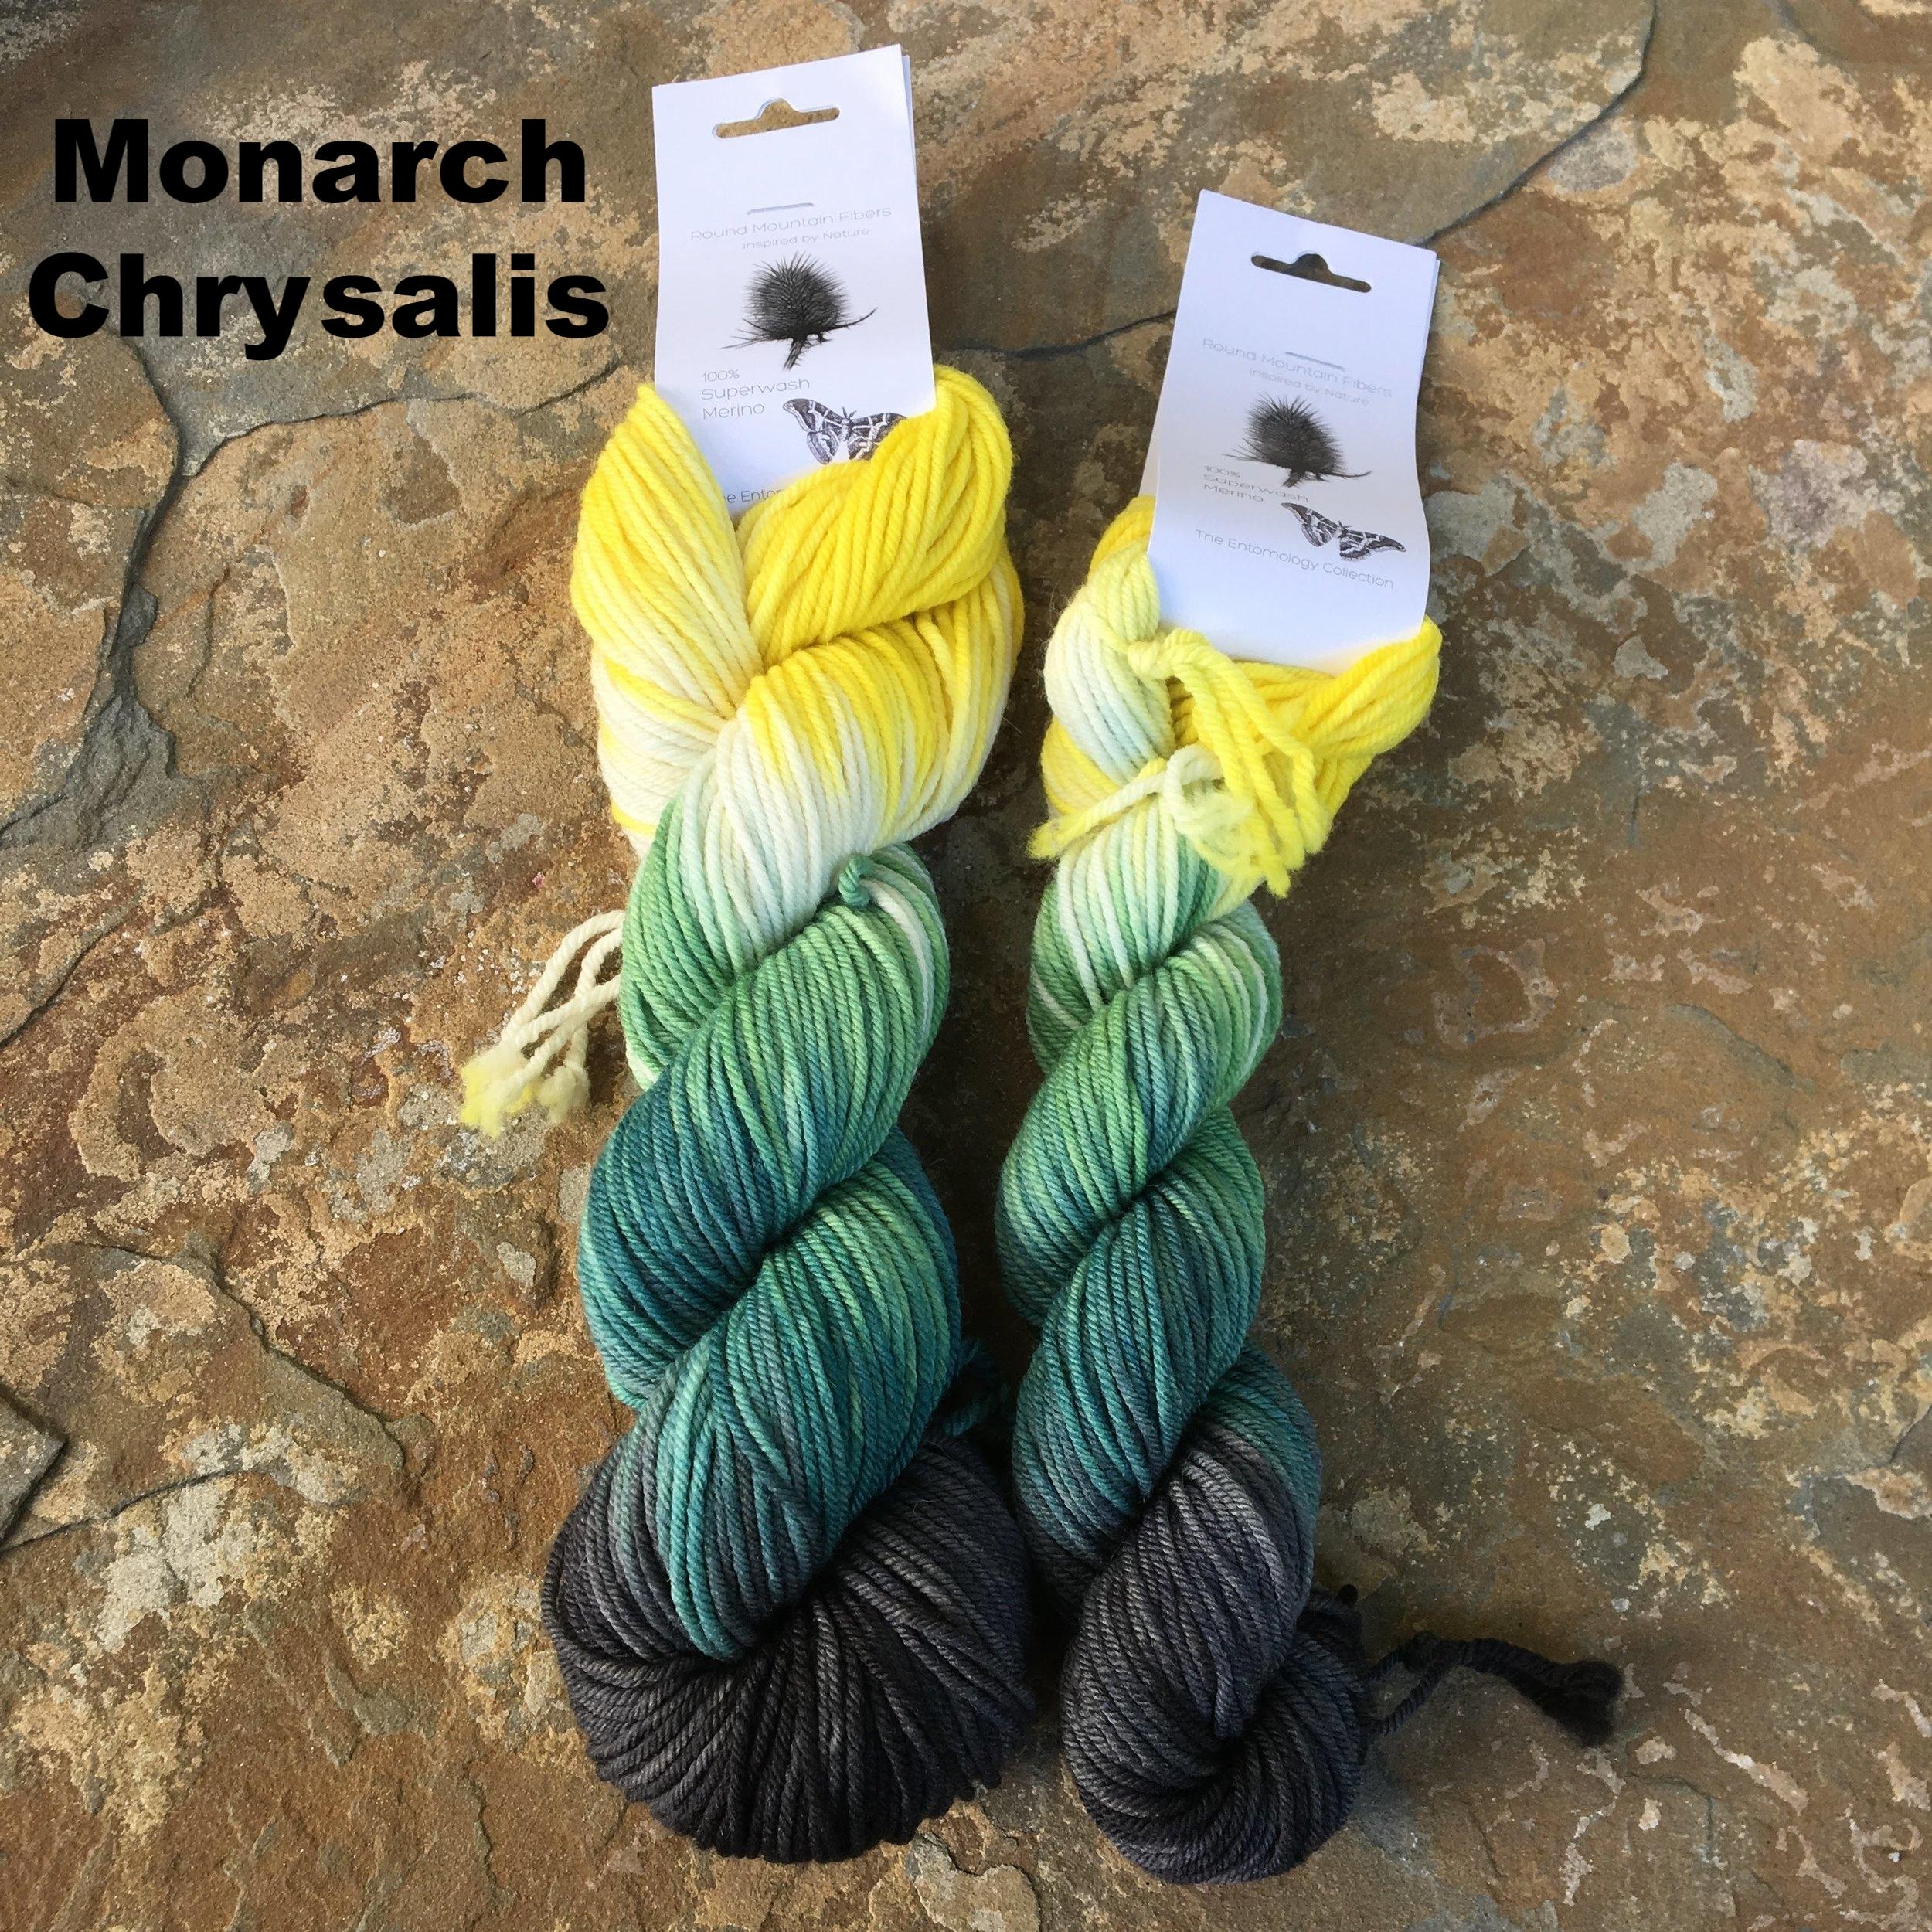 monarch chrysalis fingering.JPG